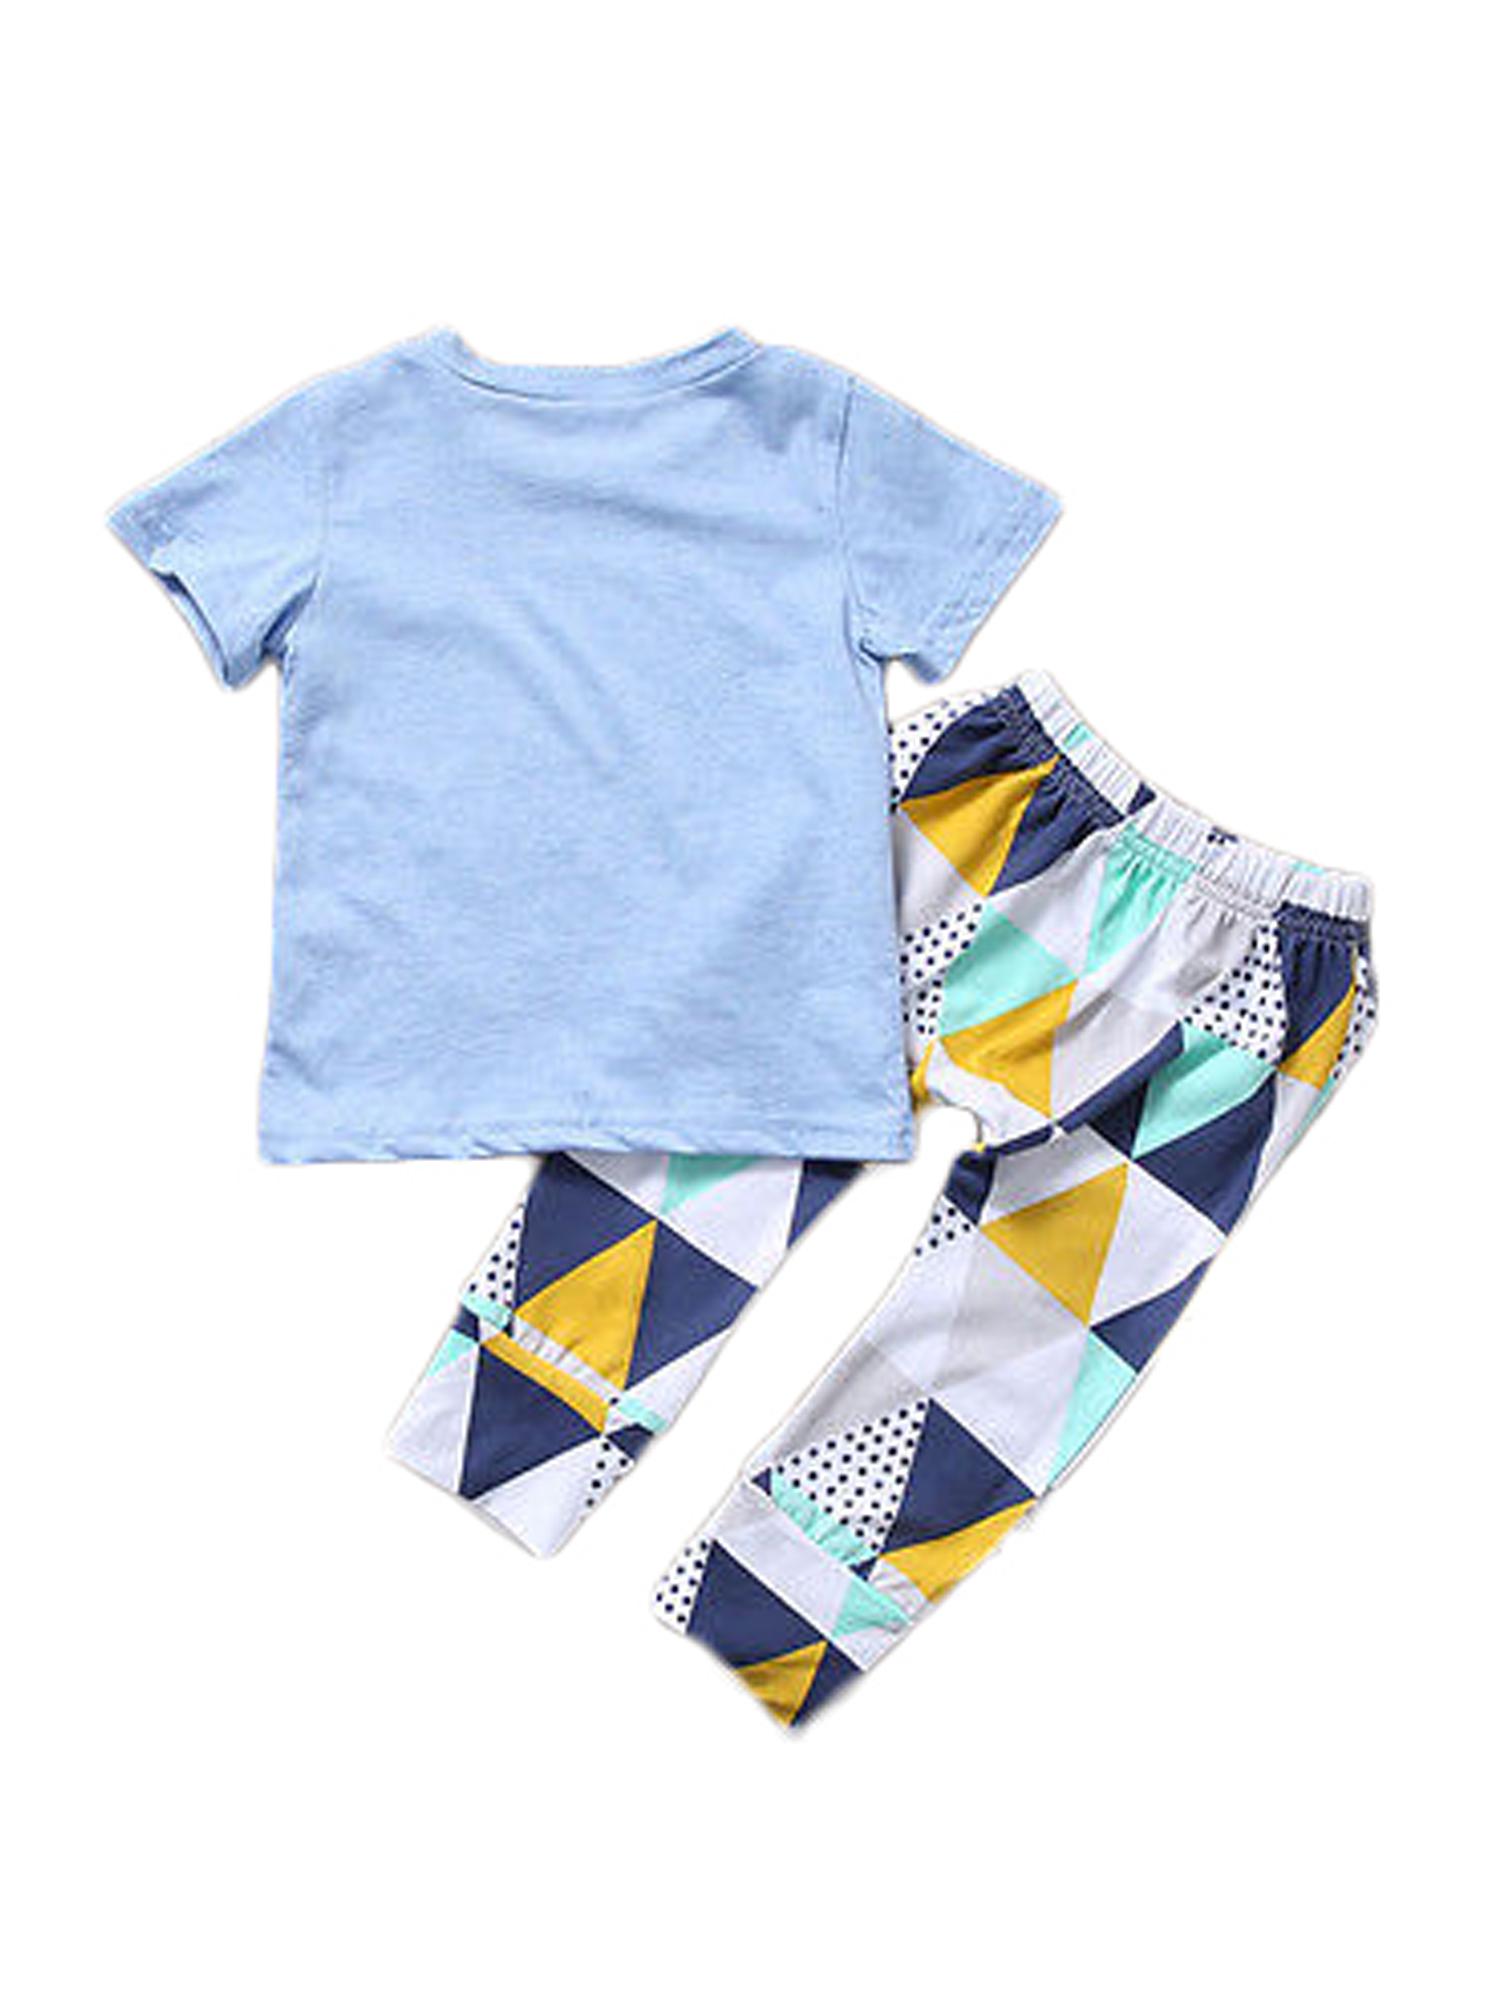 Boys Clothing Children Summer Clothes Kids T-shit And Pants Set Fashion Cotton